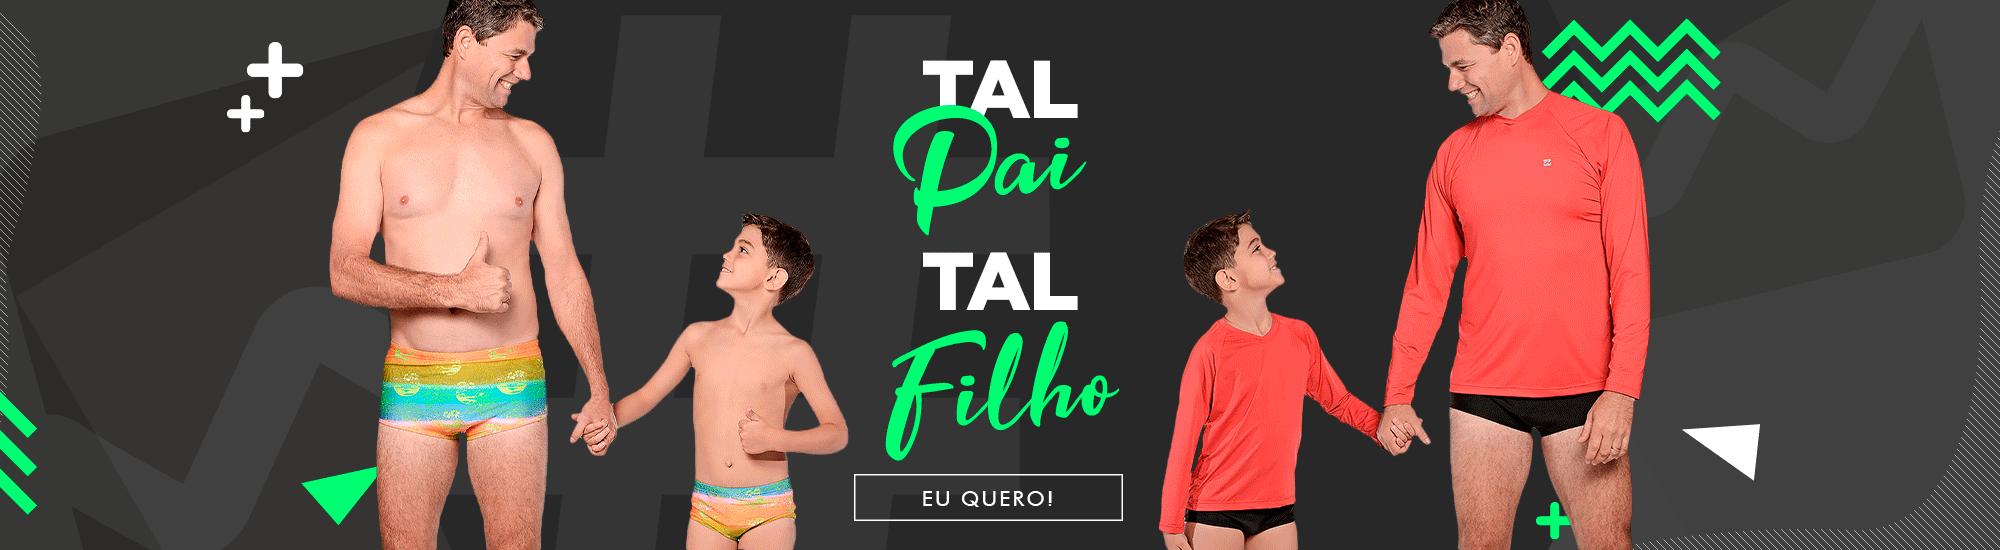 Monte seu Kit Tal Pai, Tal Filho!